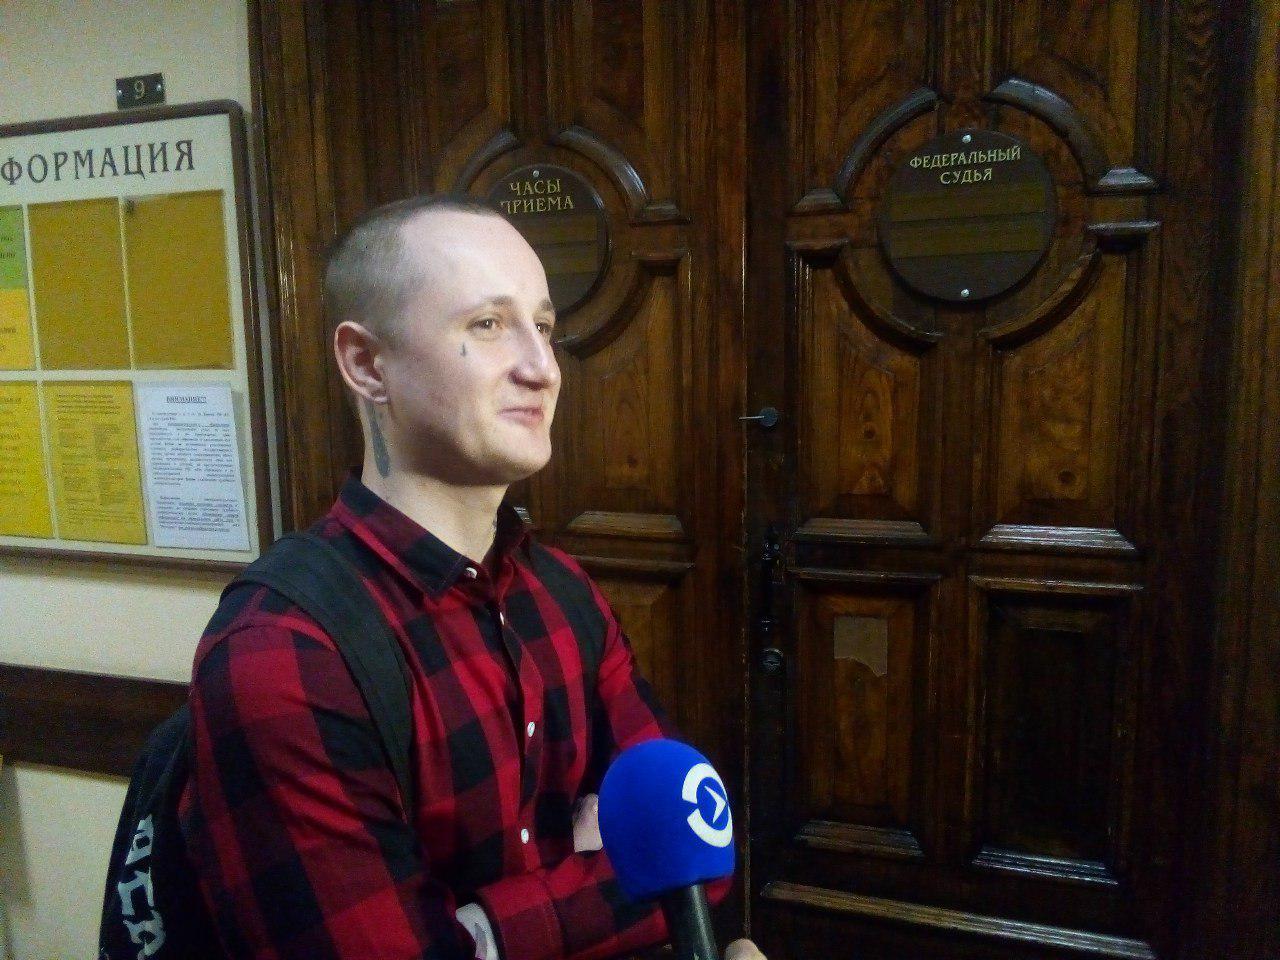 фото ЗакС политика Горсуд оправдал петербуржца Цакунова, отбывшего год в СИЗО за «насилие» над полицейским